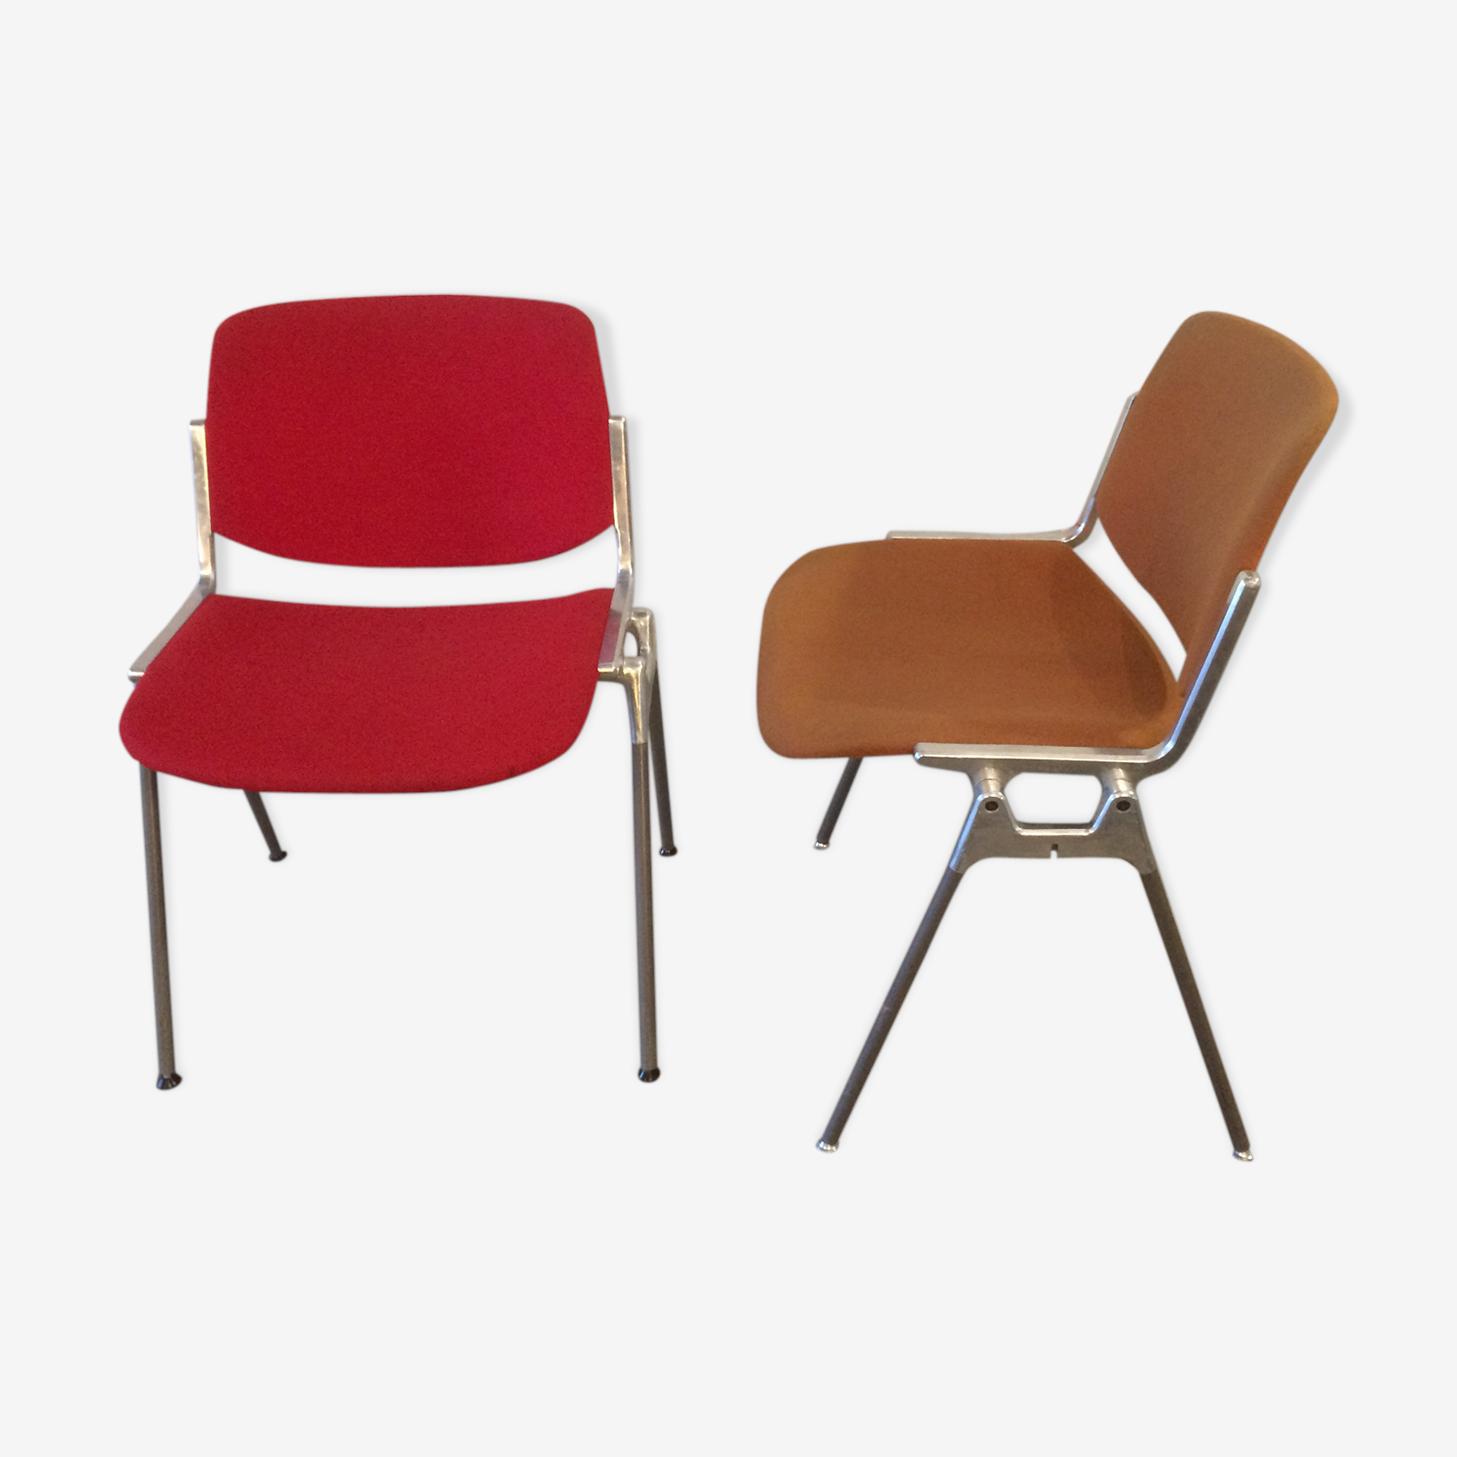 Paire de chaises Piretti